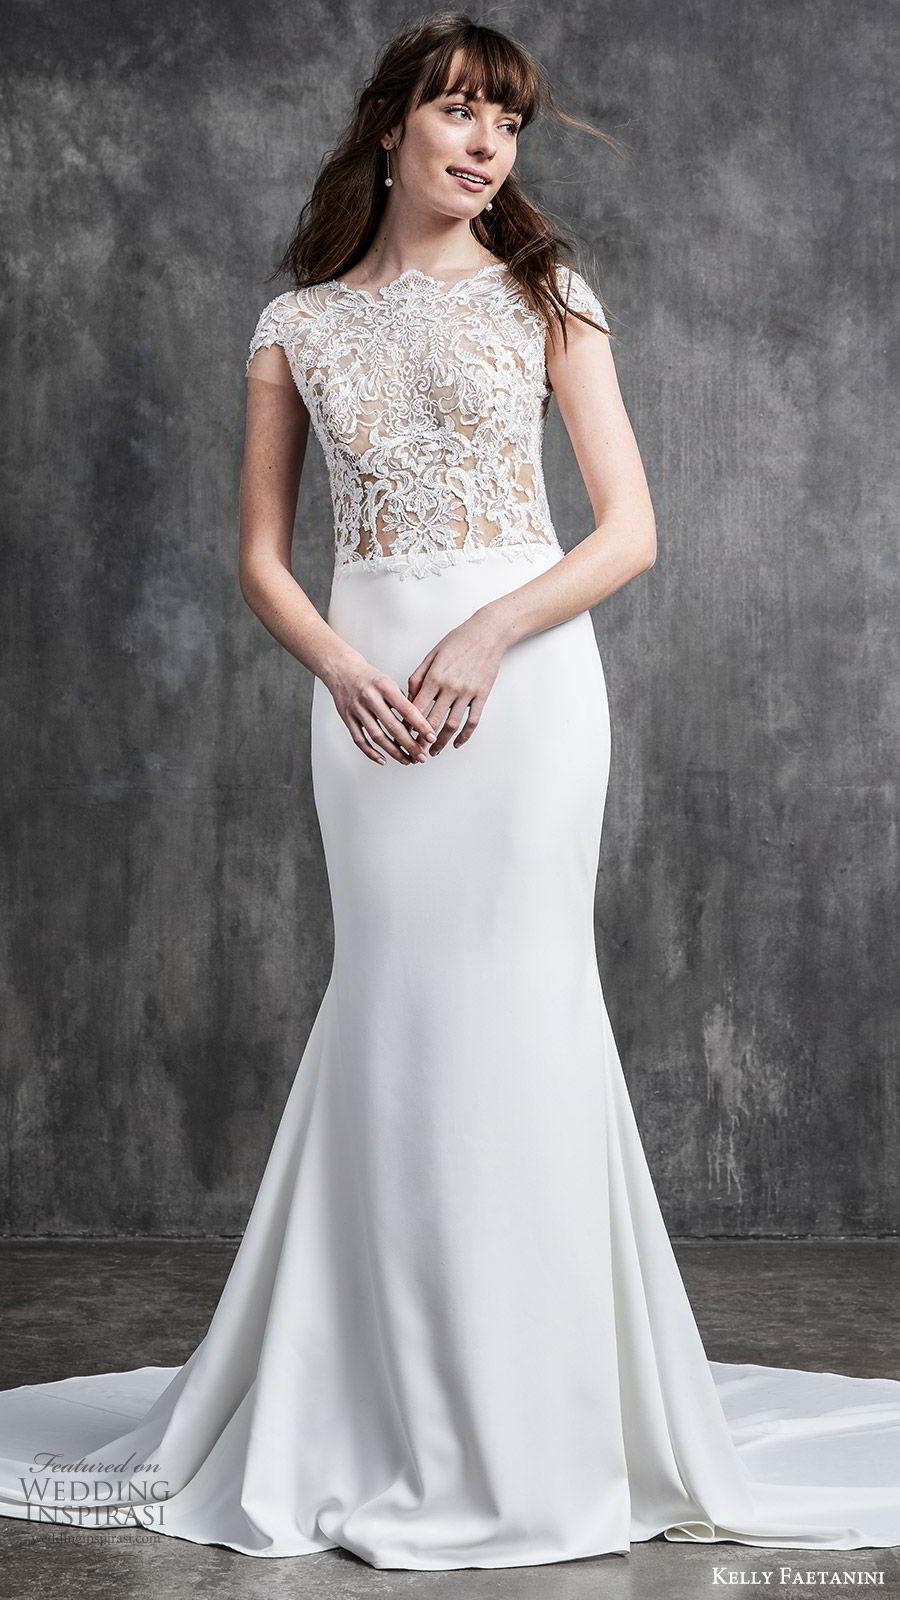 kelly faetanini spring 2020 bridal cap sleeves illusion bodice bateau neckline sheer lace bodice fit flare sheath mermaid wedding dress (1) elegant romantic chapel train mv